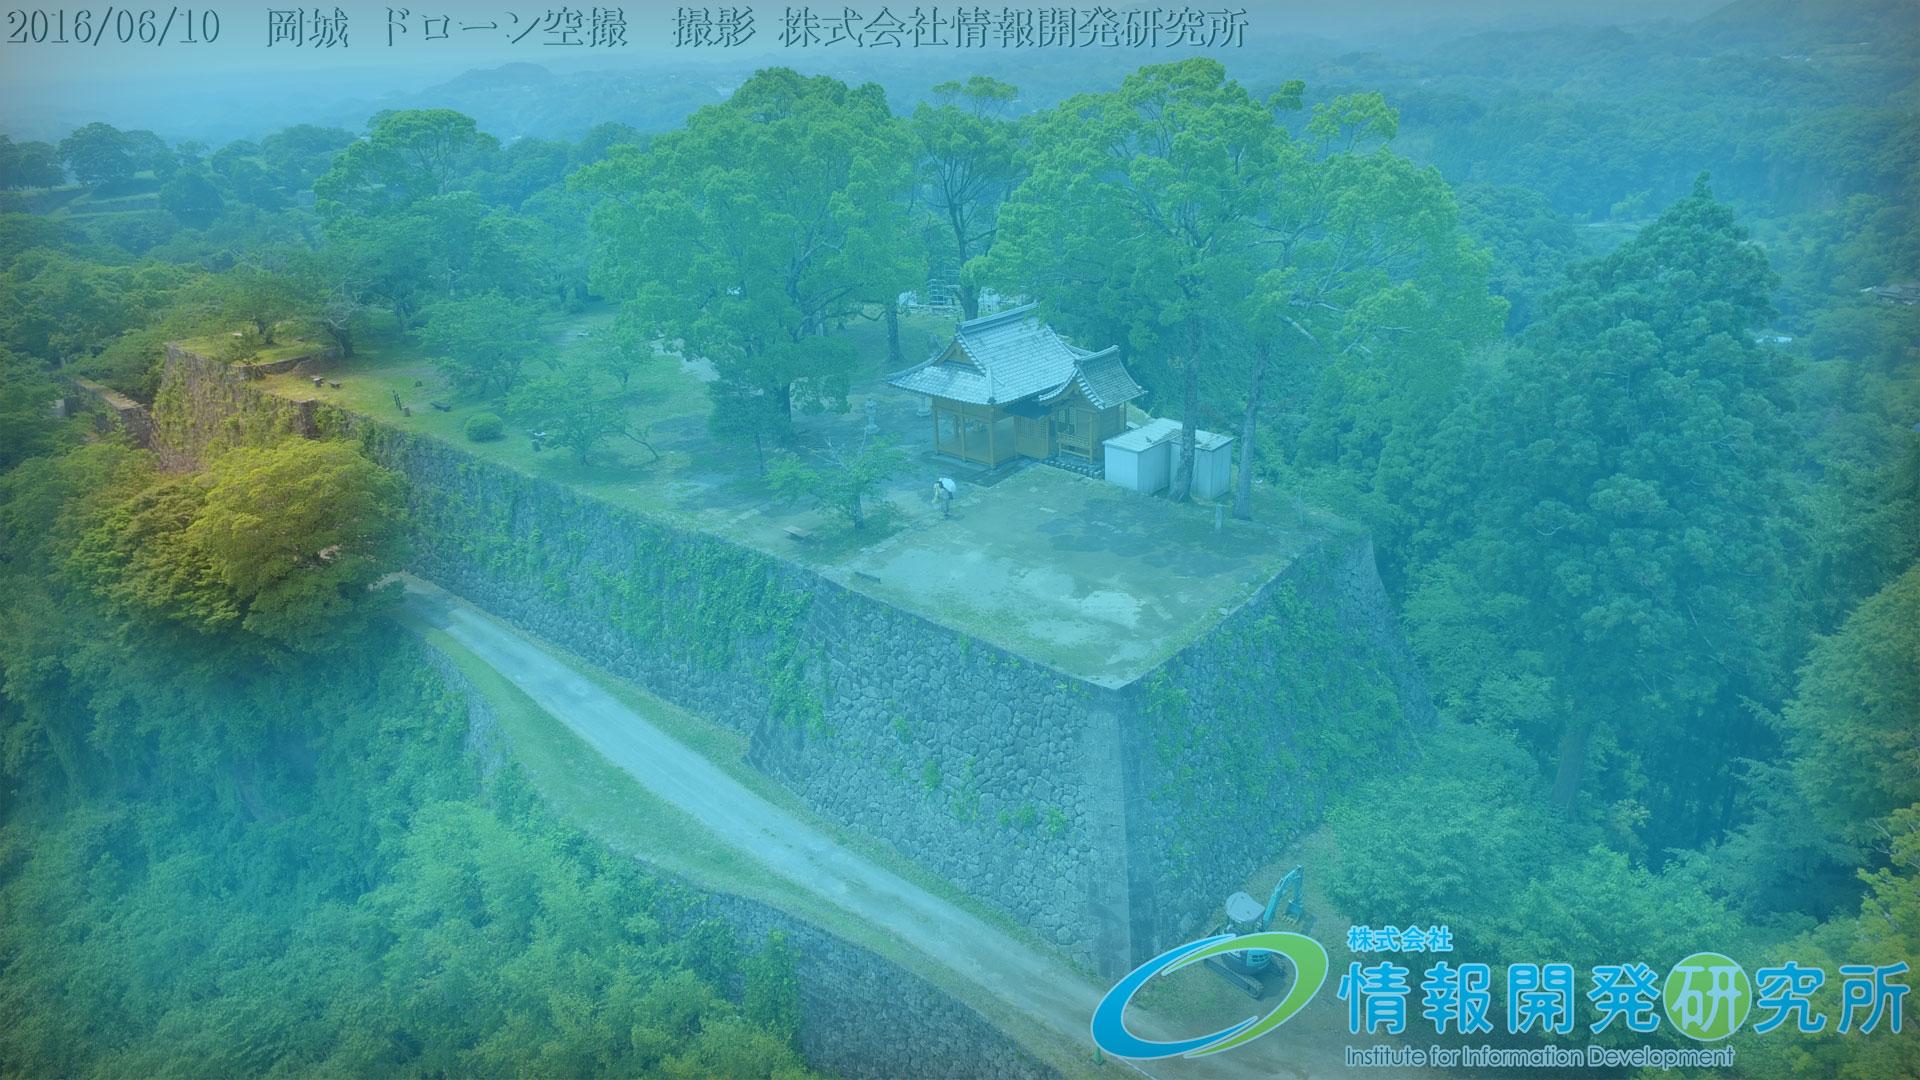 岡城本丸の石垣① 「整層乱積」seisou